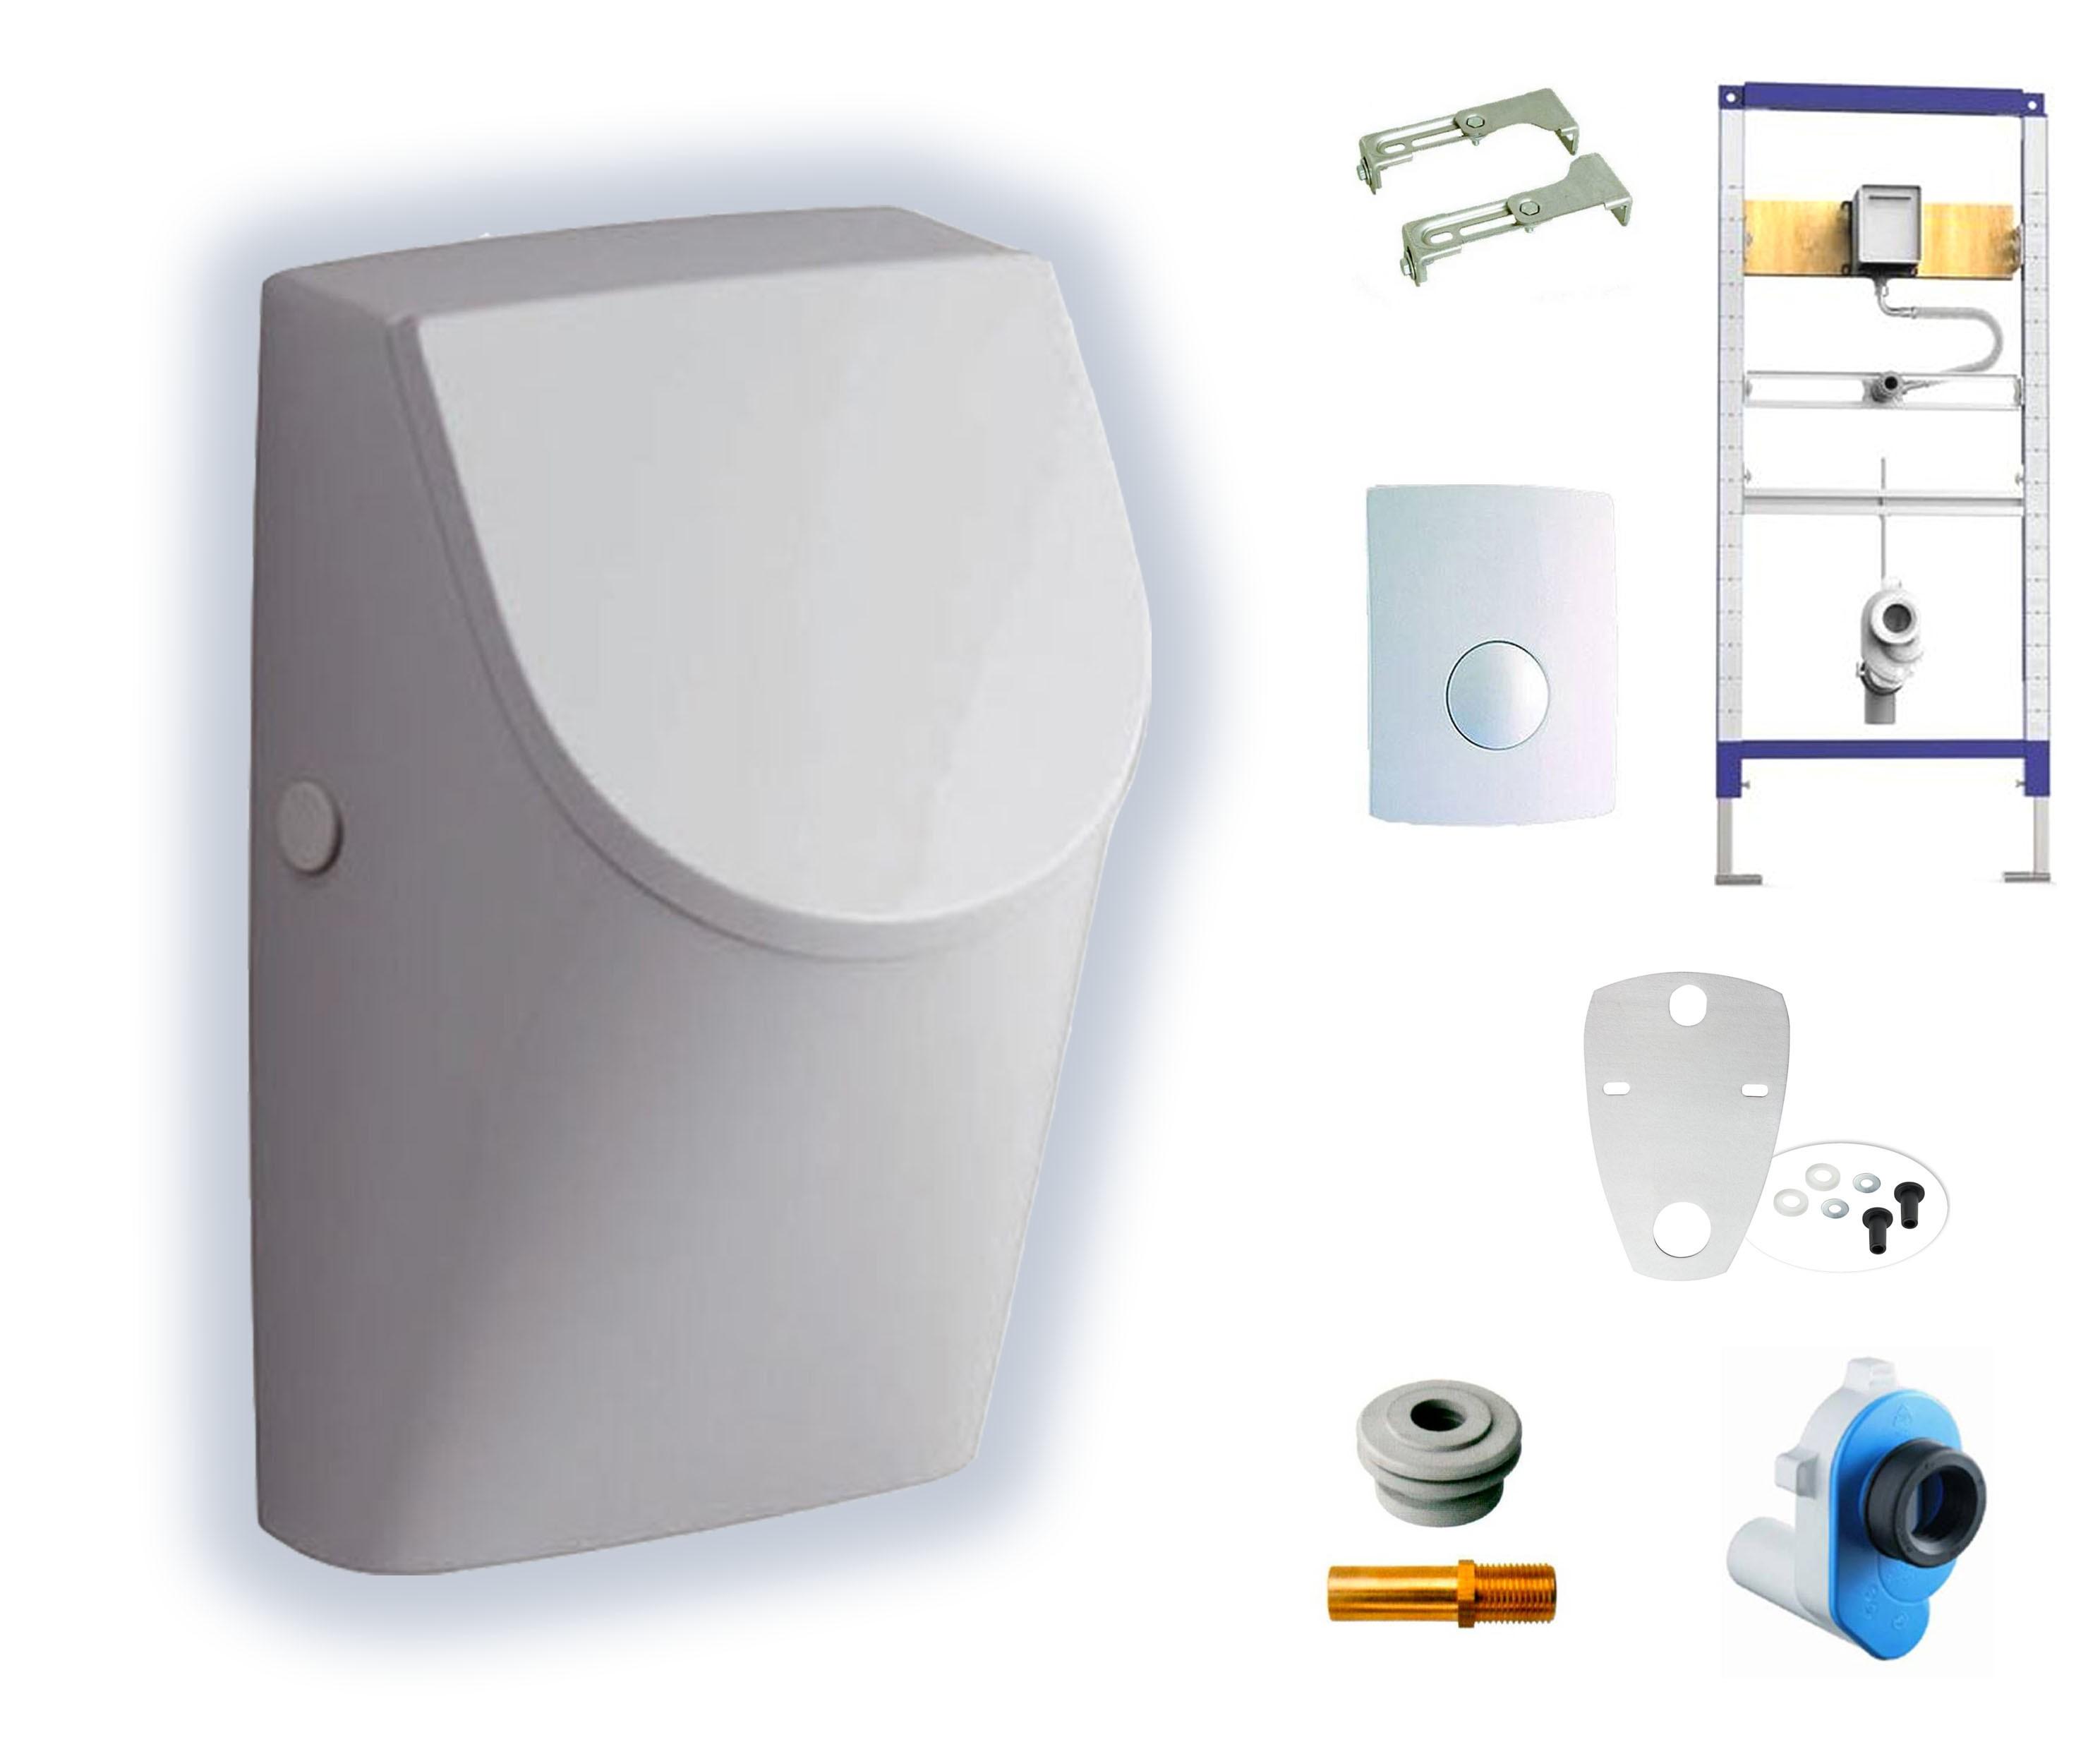 keramag renova nr 1 plan urinal set mit deckel. Black Bedroom Furniture Sets. Home Design Ideas